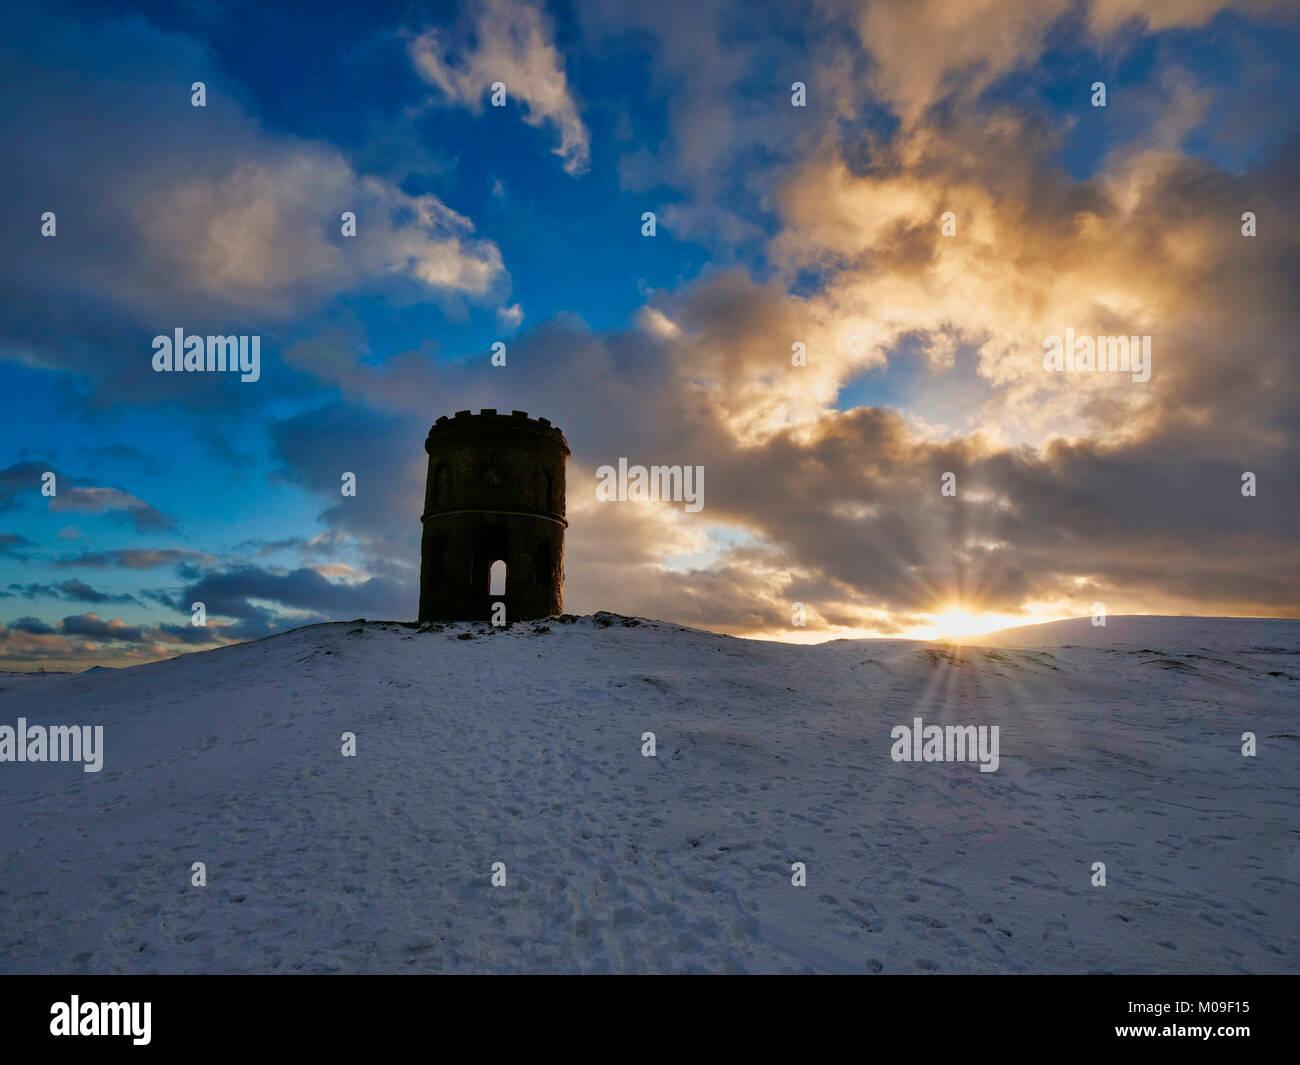 Buxton, Derbyshire, UK. 19th January, 2018. UK Weather: Sunset over Solomon's Temple Buxton Derbyshire, also - Stock Image